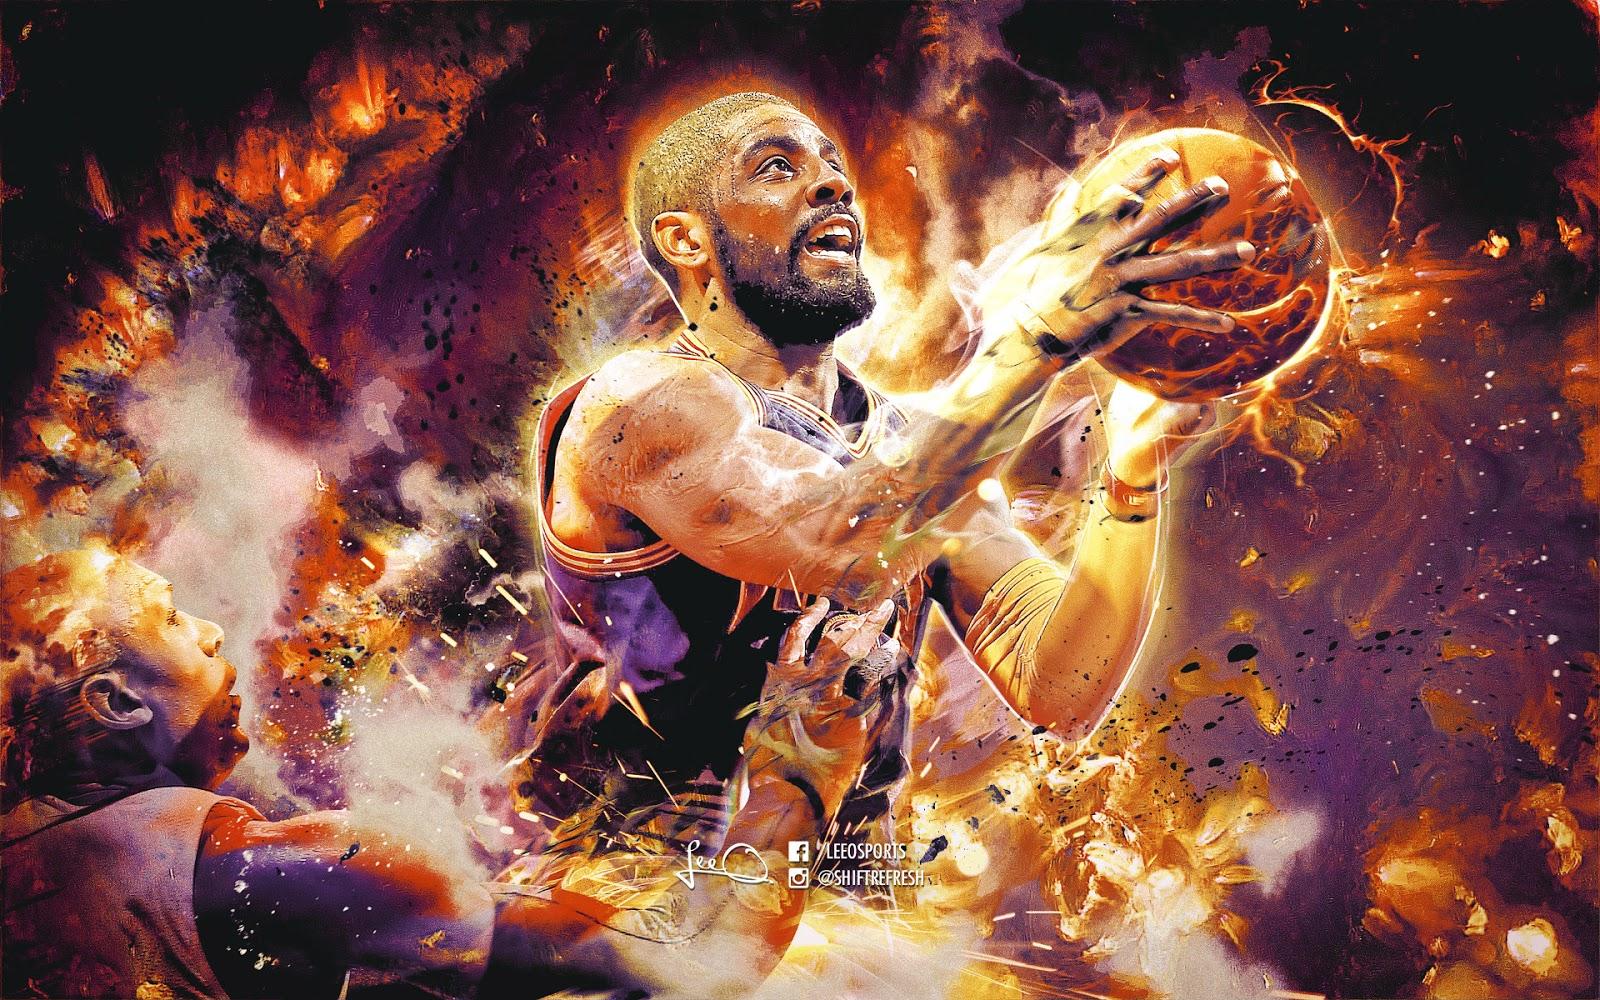 Fond Dcran Basketball Hd Gratuit Fond Dcran Hd